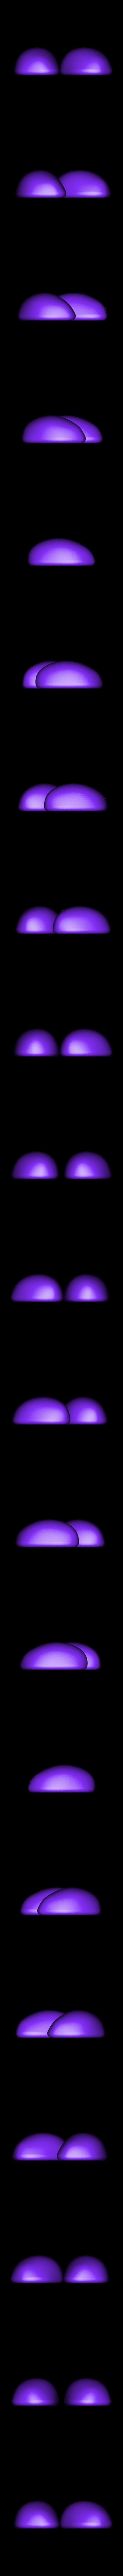 86Duino-Kiki-f.STL Download free STL file Little Twin Stars / リトルツインスターズ / 雙子星 -- Kiki(キキ) • 3D printing design, 86Duino